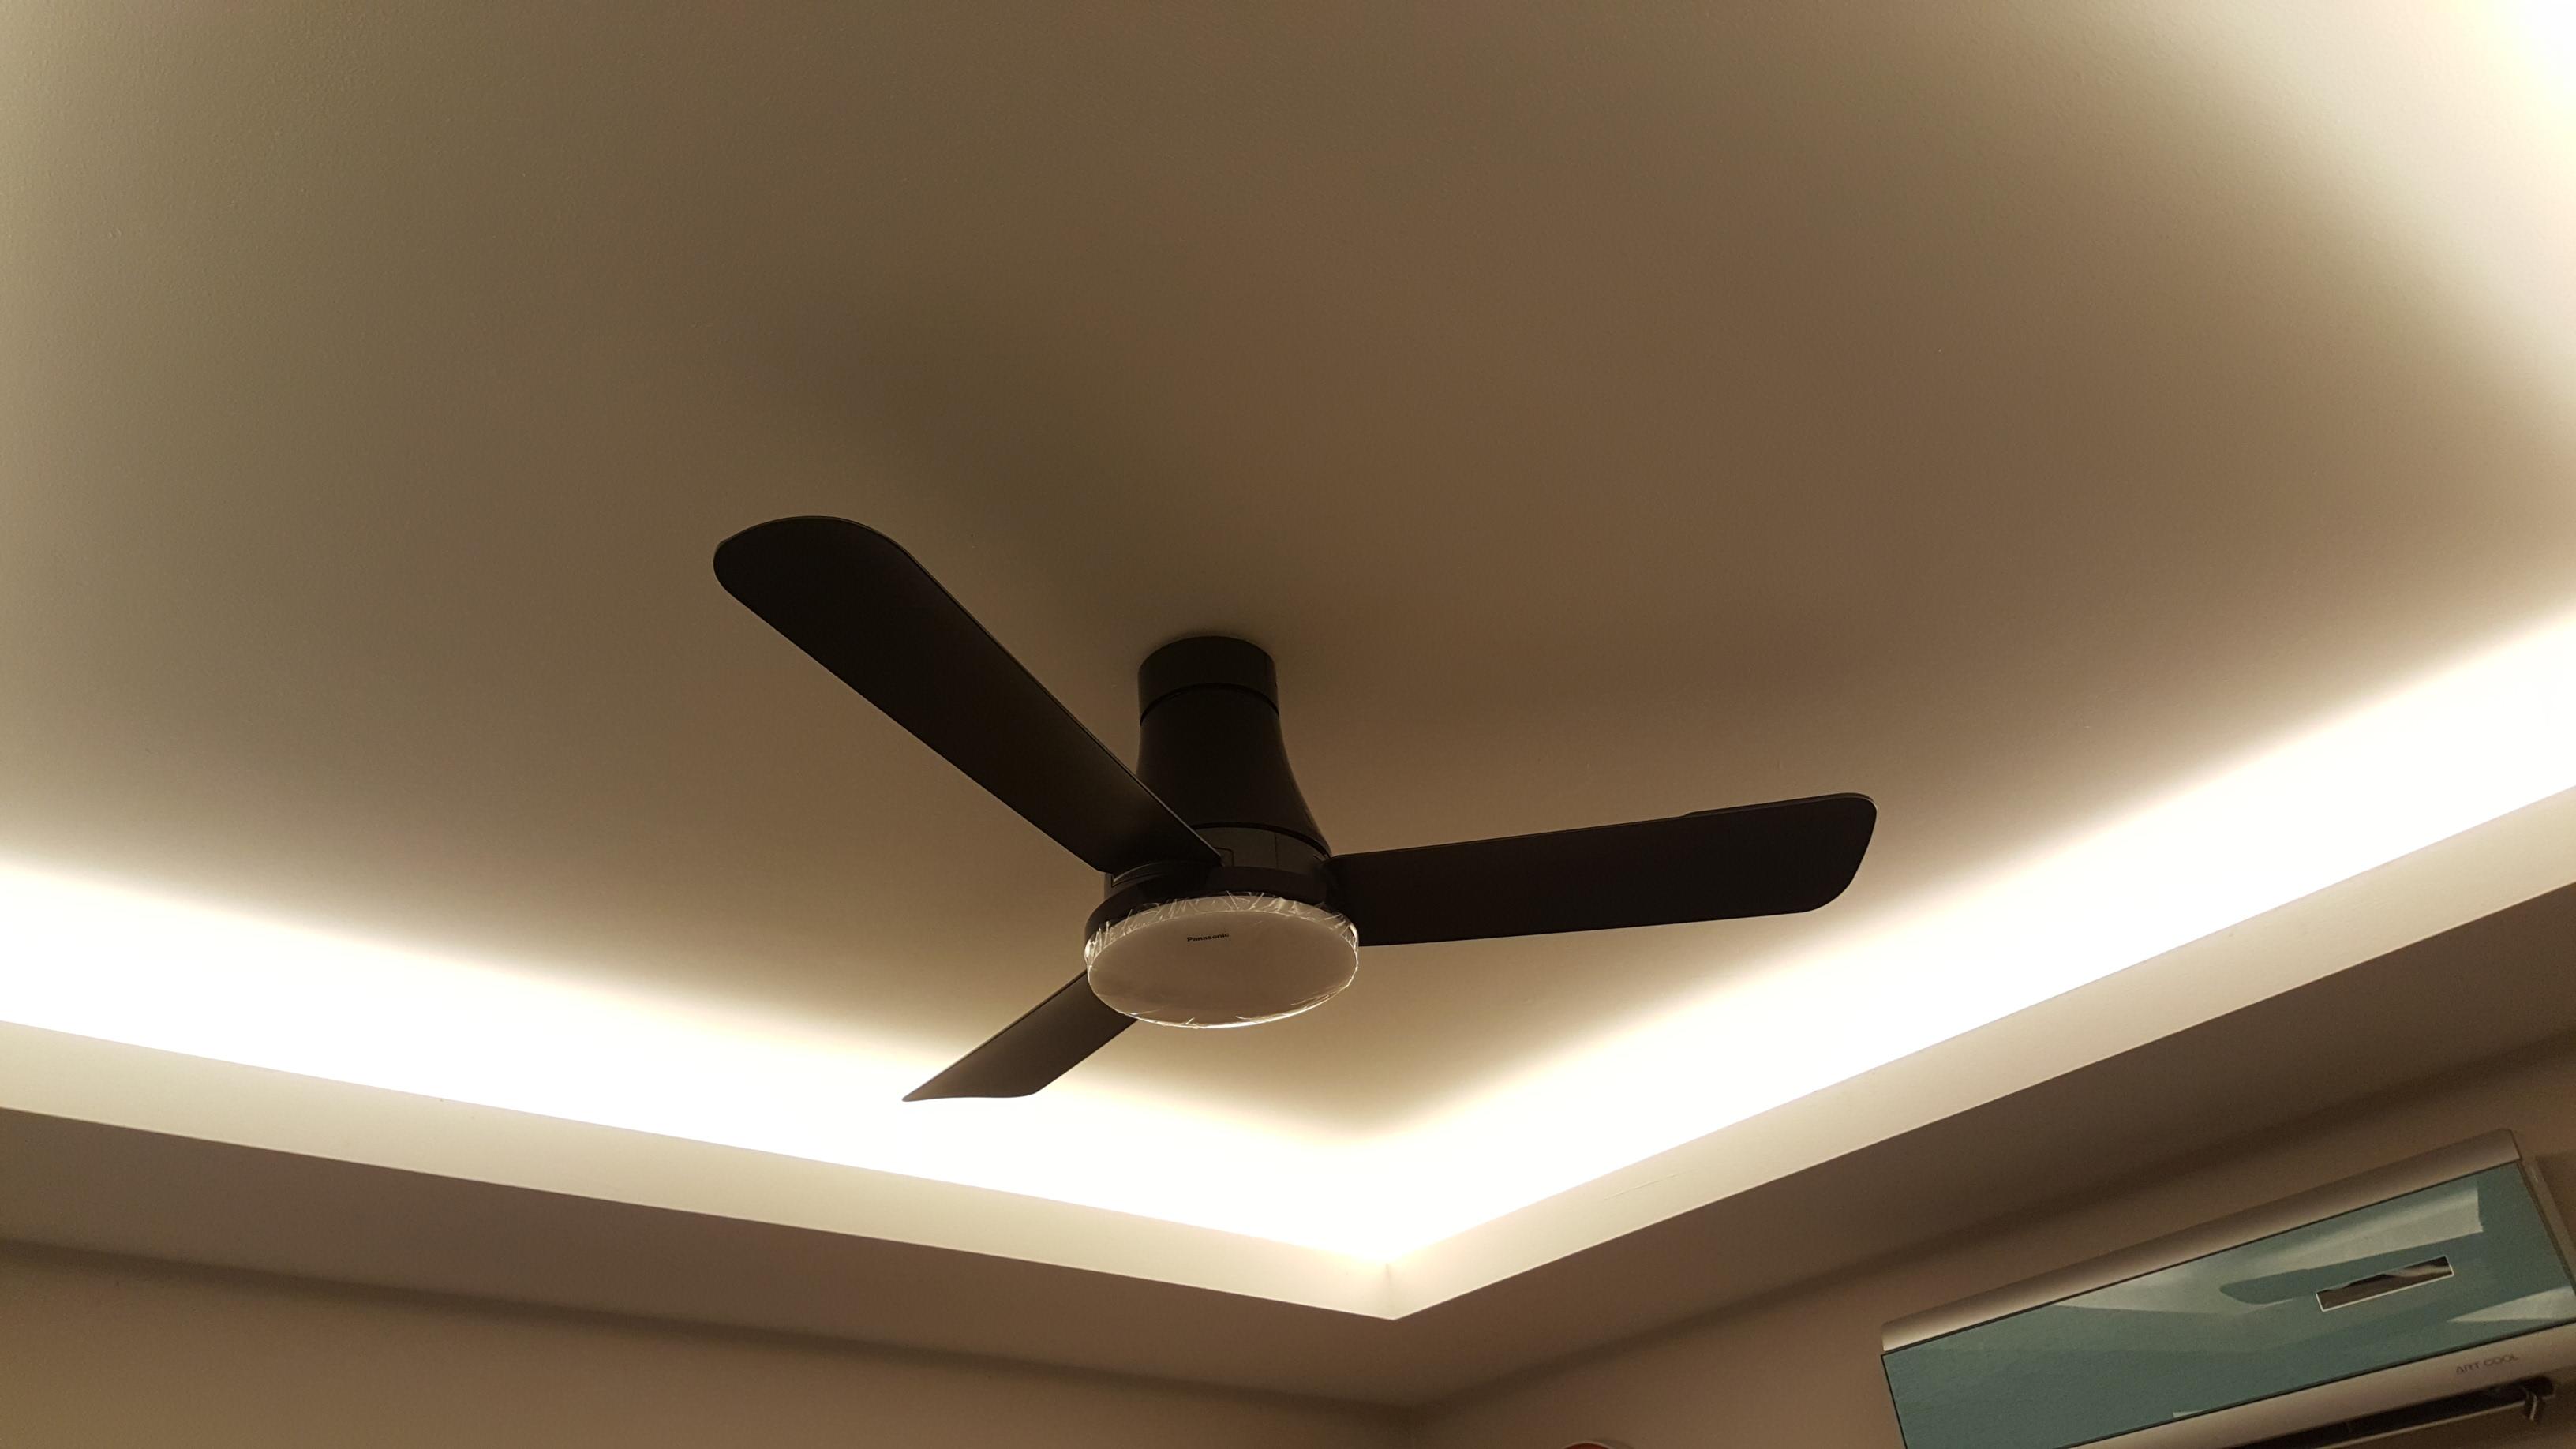 Dining room fan changed Panasonic LED 3 Blade Ceiling Fan F M12GX